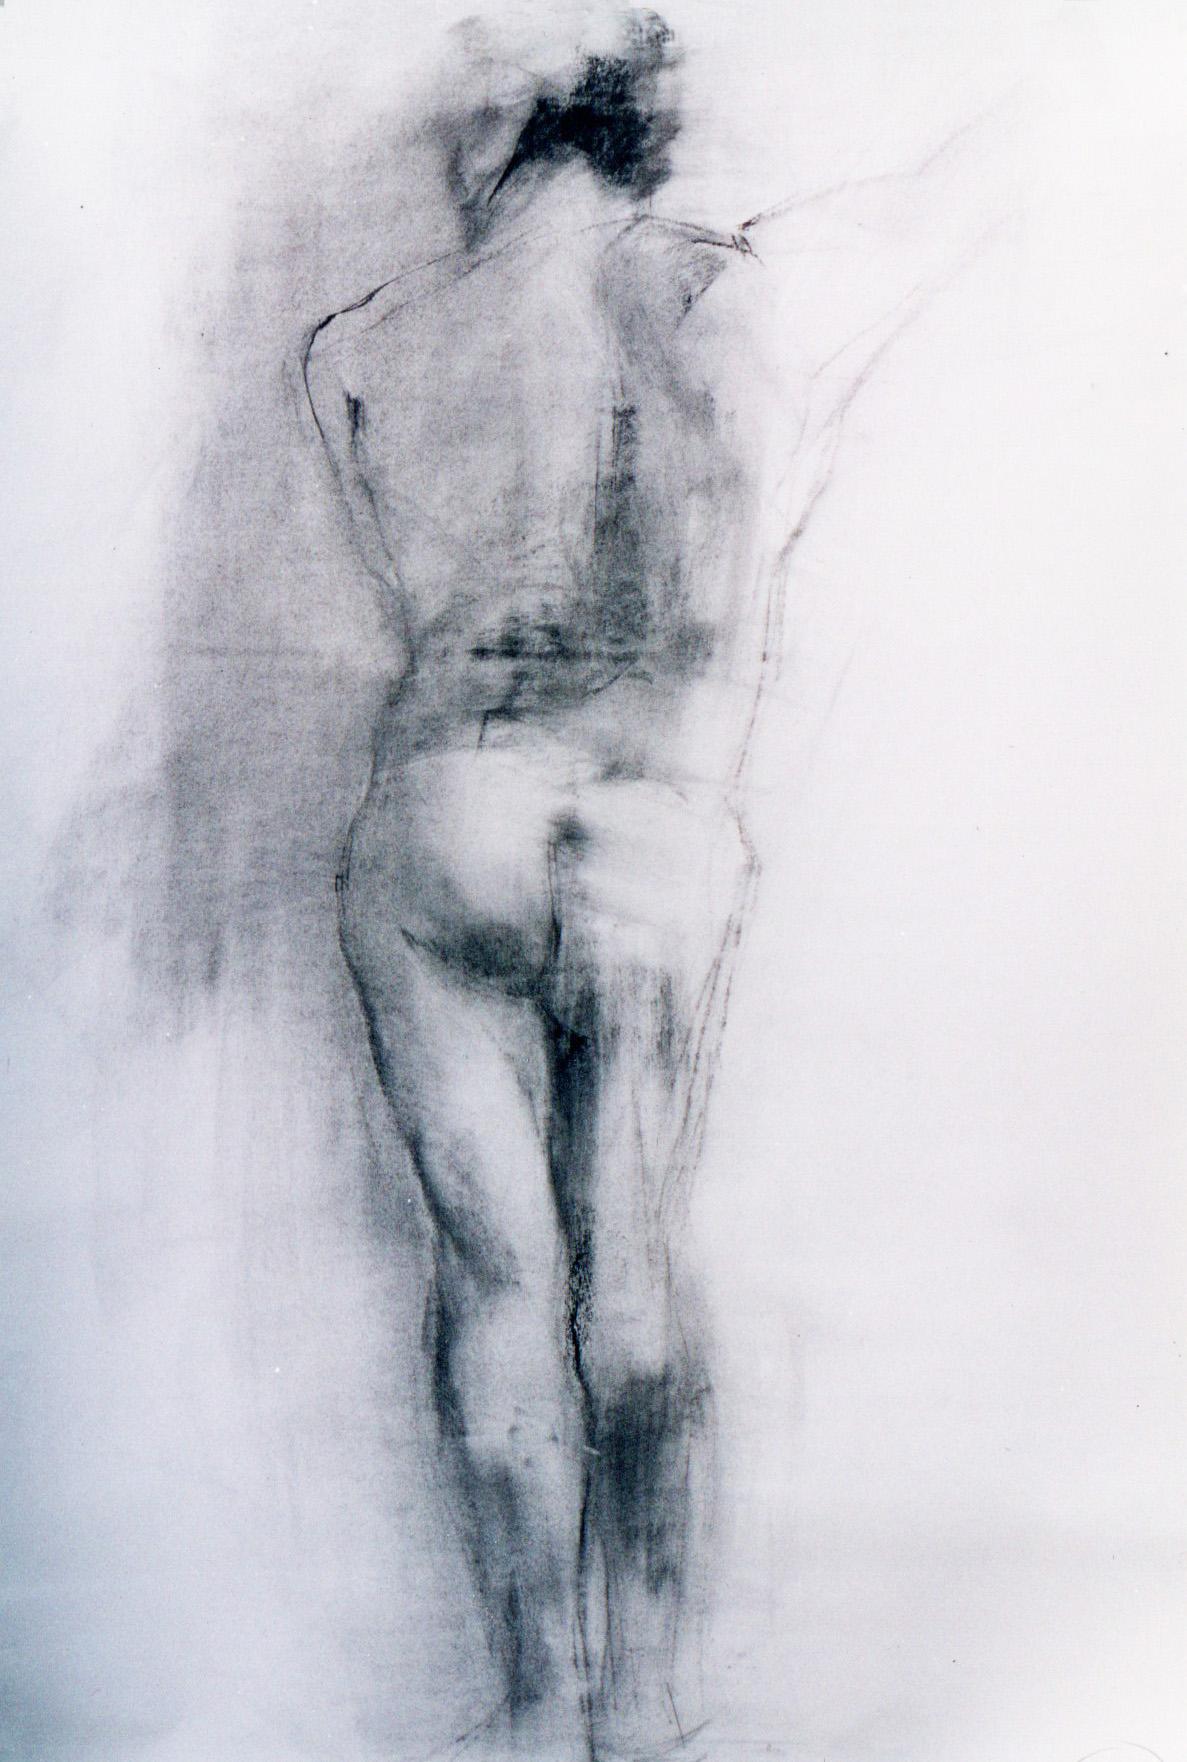 modelo-carboncillo-alejandra-caballero-dibujo-hombre-desnudo-de-espaldas